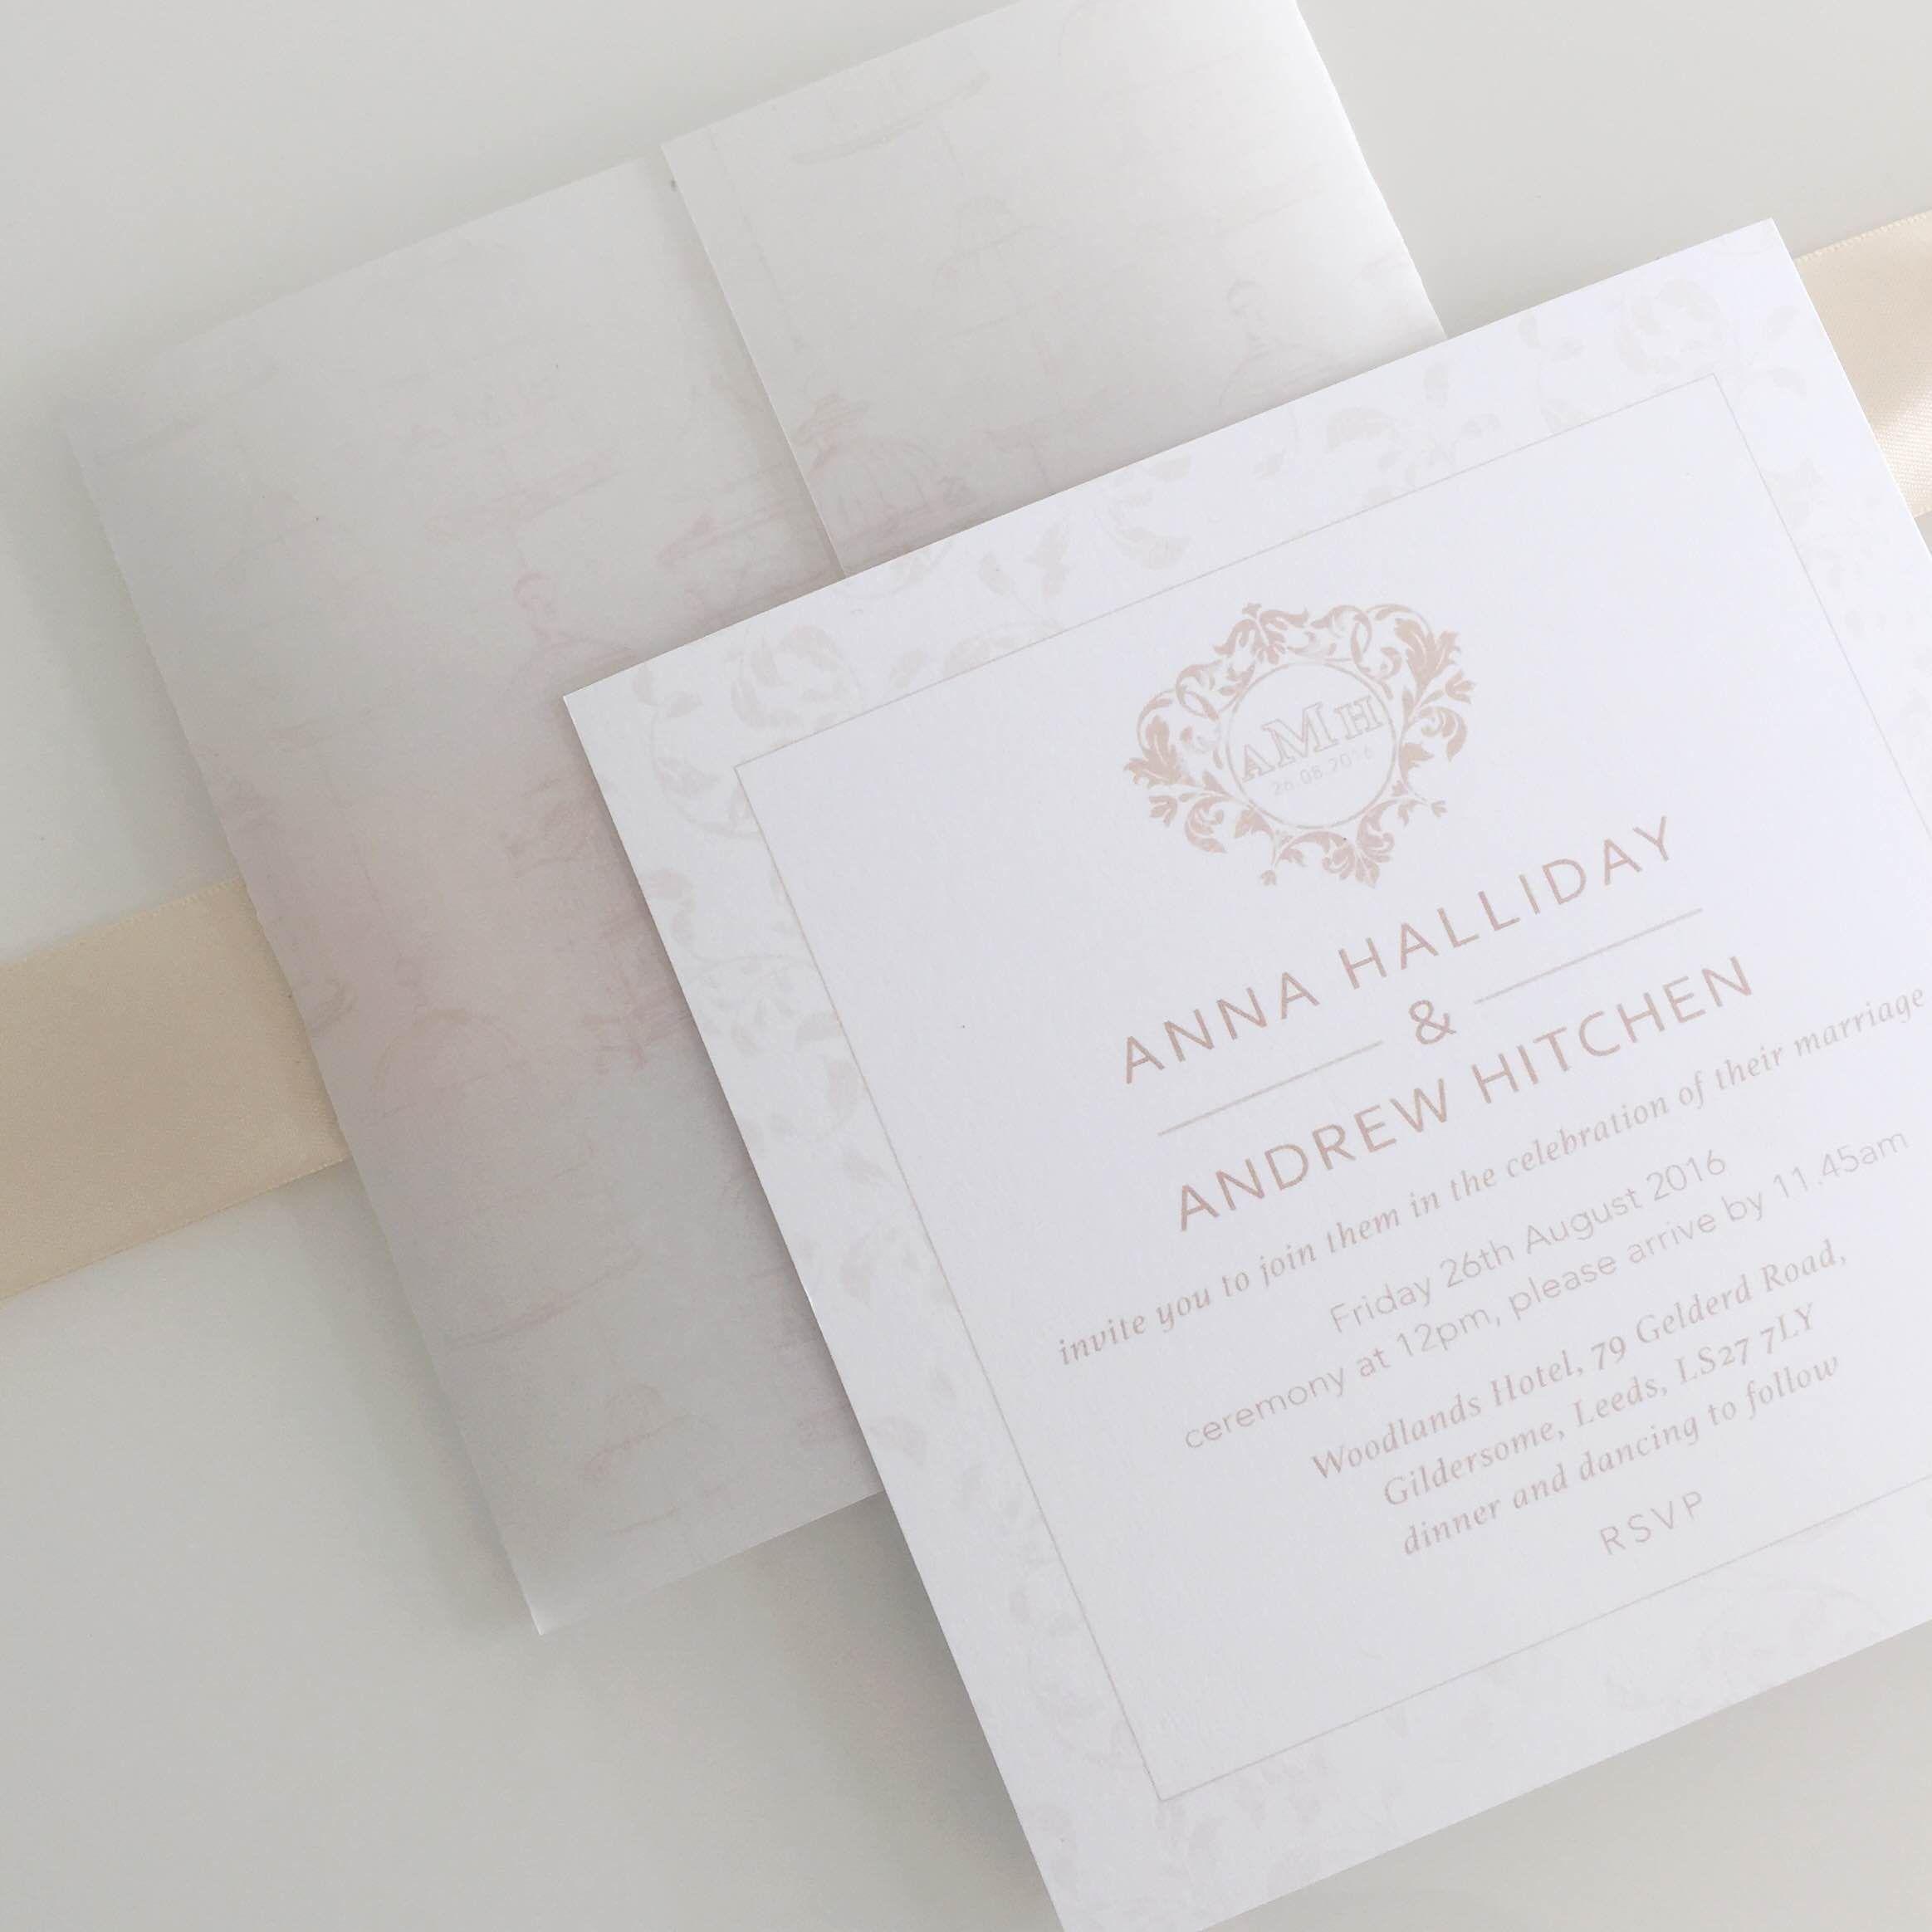 Bespoke Wedding Invitations Leeds | Invitationswedd.org